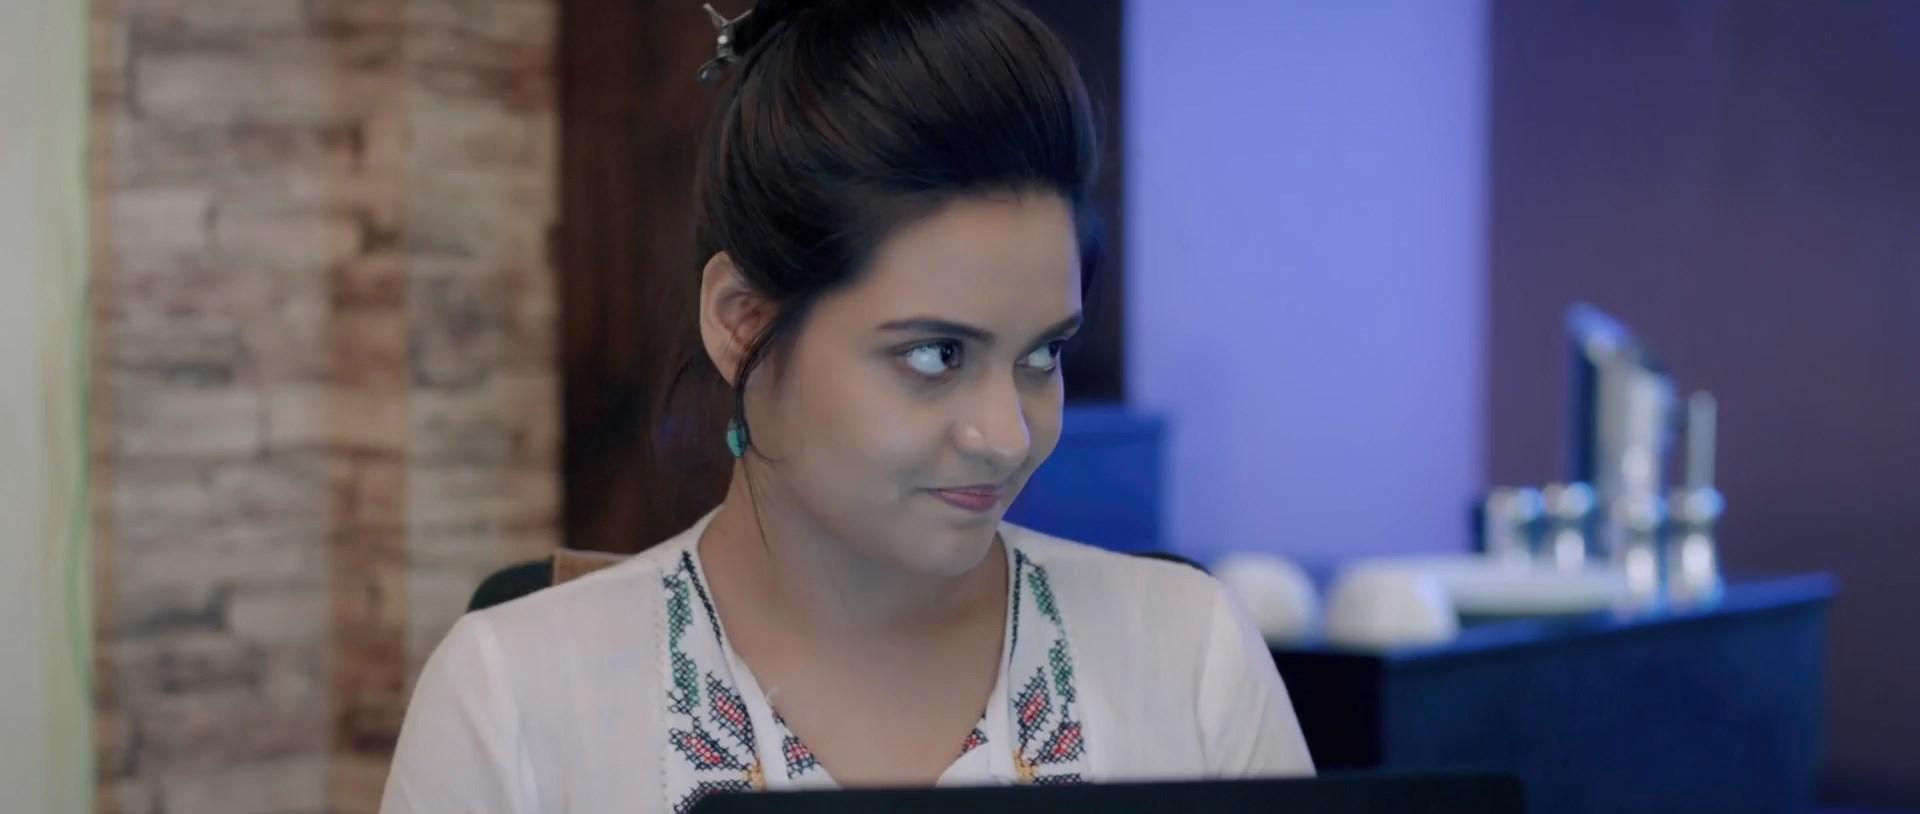 KAYA The Mystery Unfolds 2021 Bengali Movie 1080p WEB DL x264 AAC.mp4 snapshot 00.07.22.125